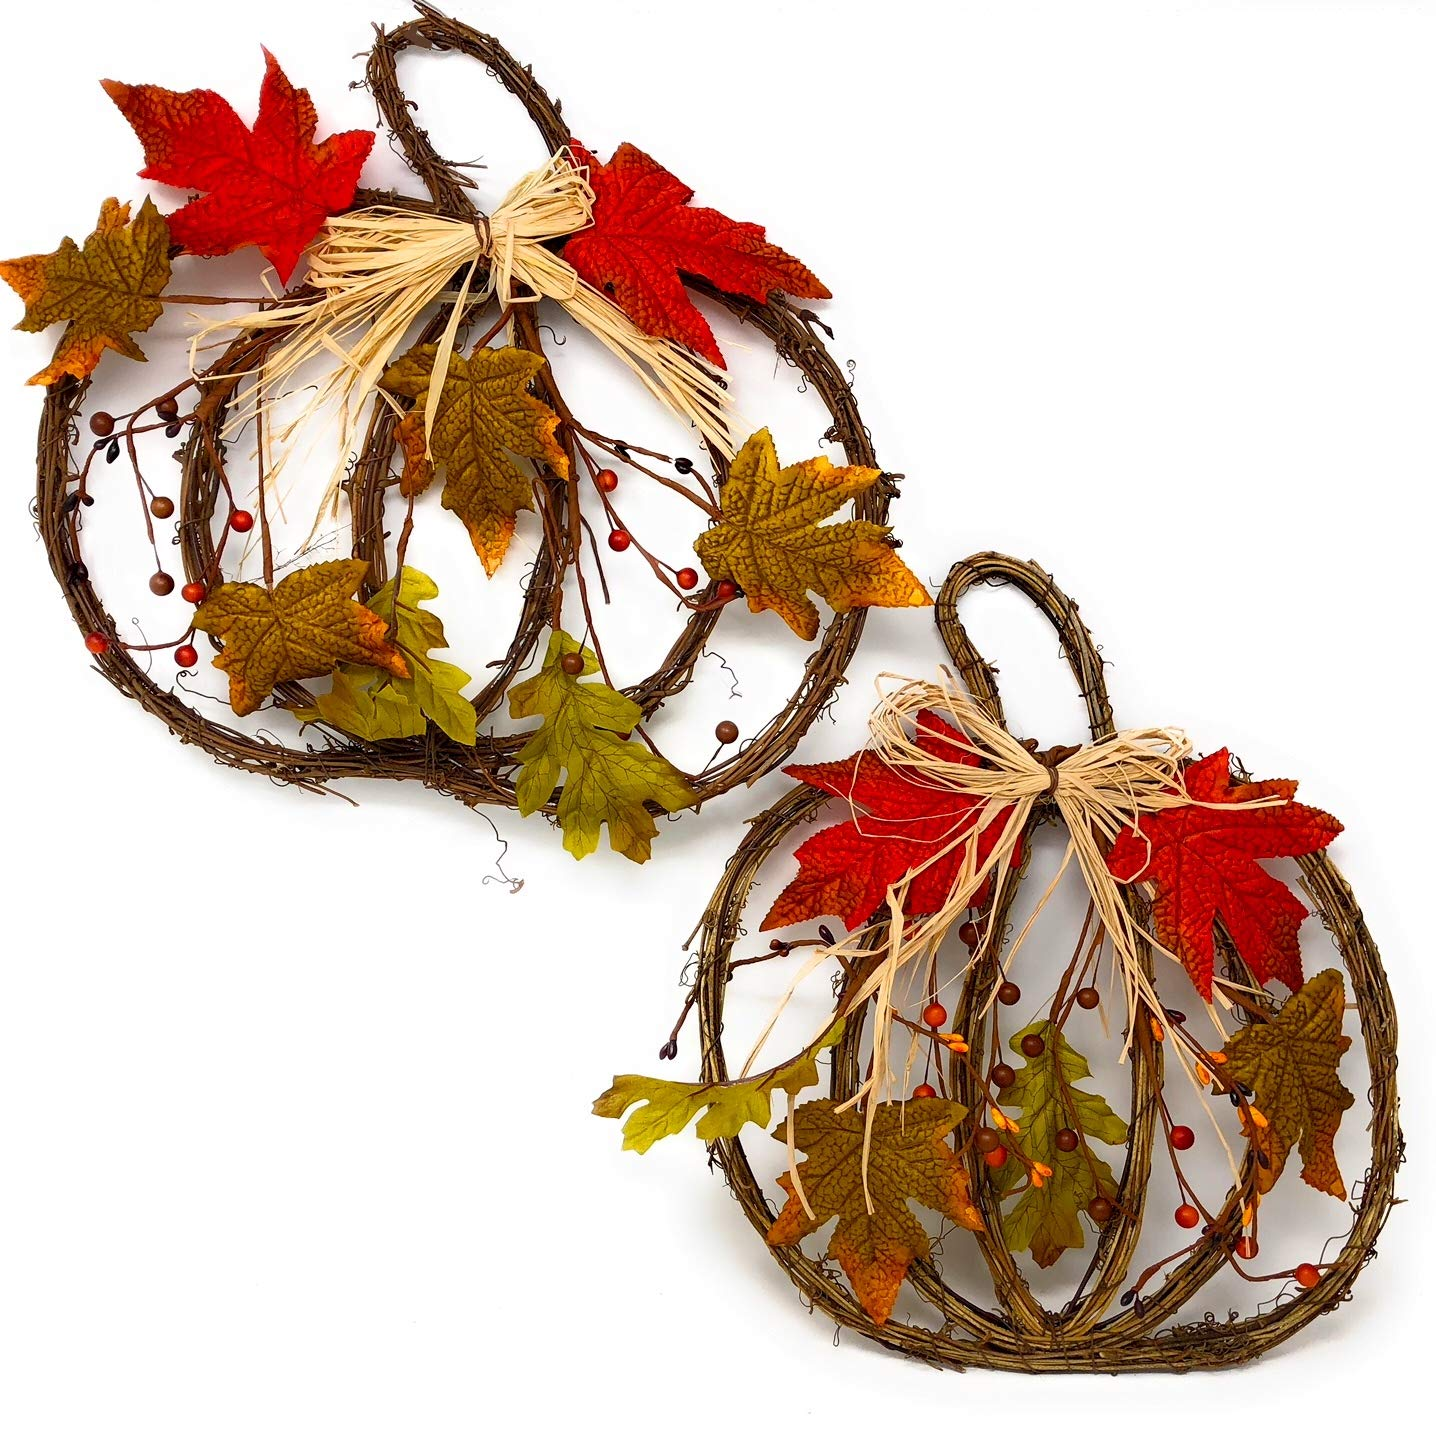 "D.I.D. Harvest Thanksgiving Pumpkin Wreath Fall Autumn Door Wall Decor Indoor Outdoor Multicolor Set of 2 (15"" x 13"" & 13 X 14)"